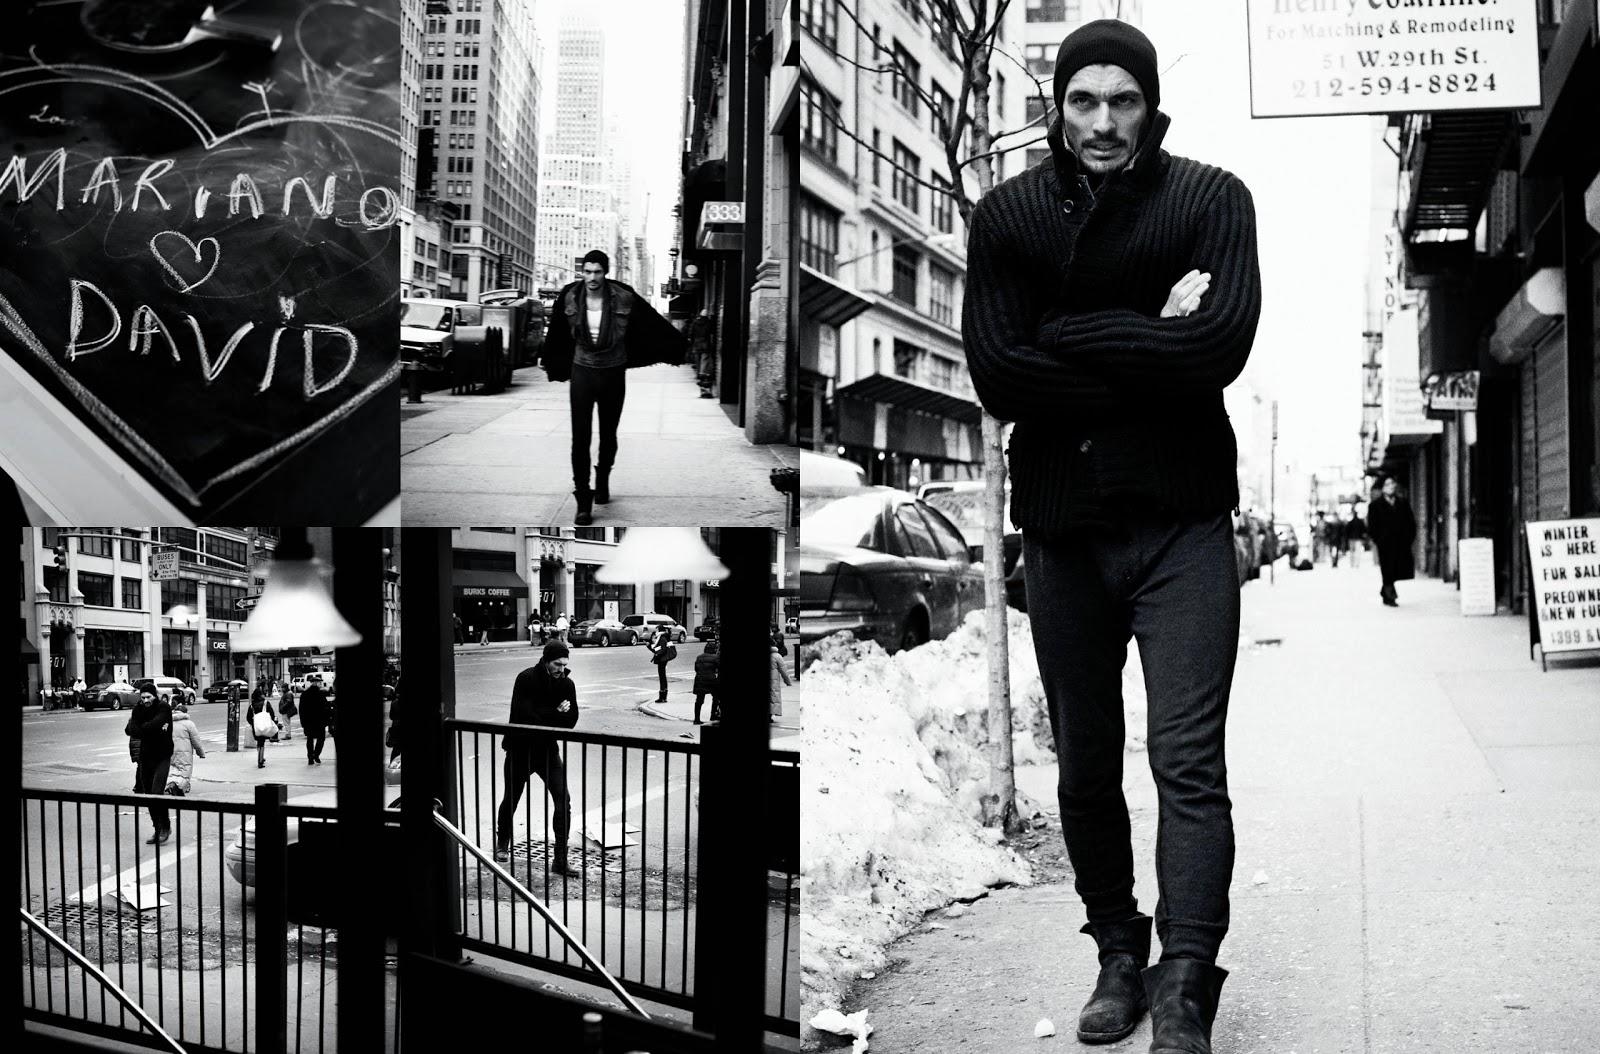 part 3 Metropolitan - David gandy for Dolce & Gabbana book ...